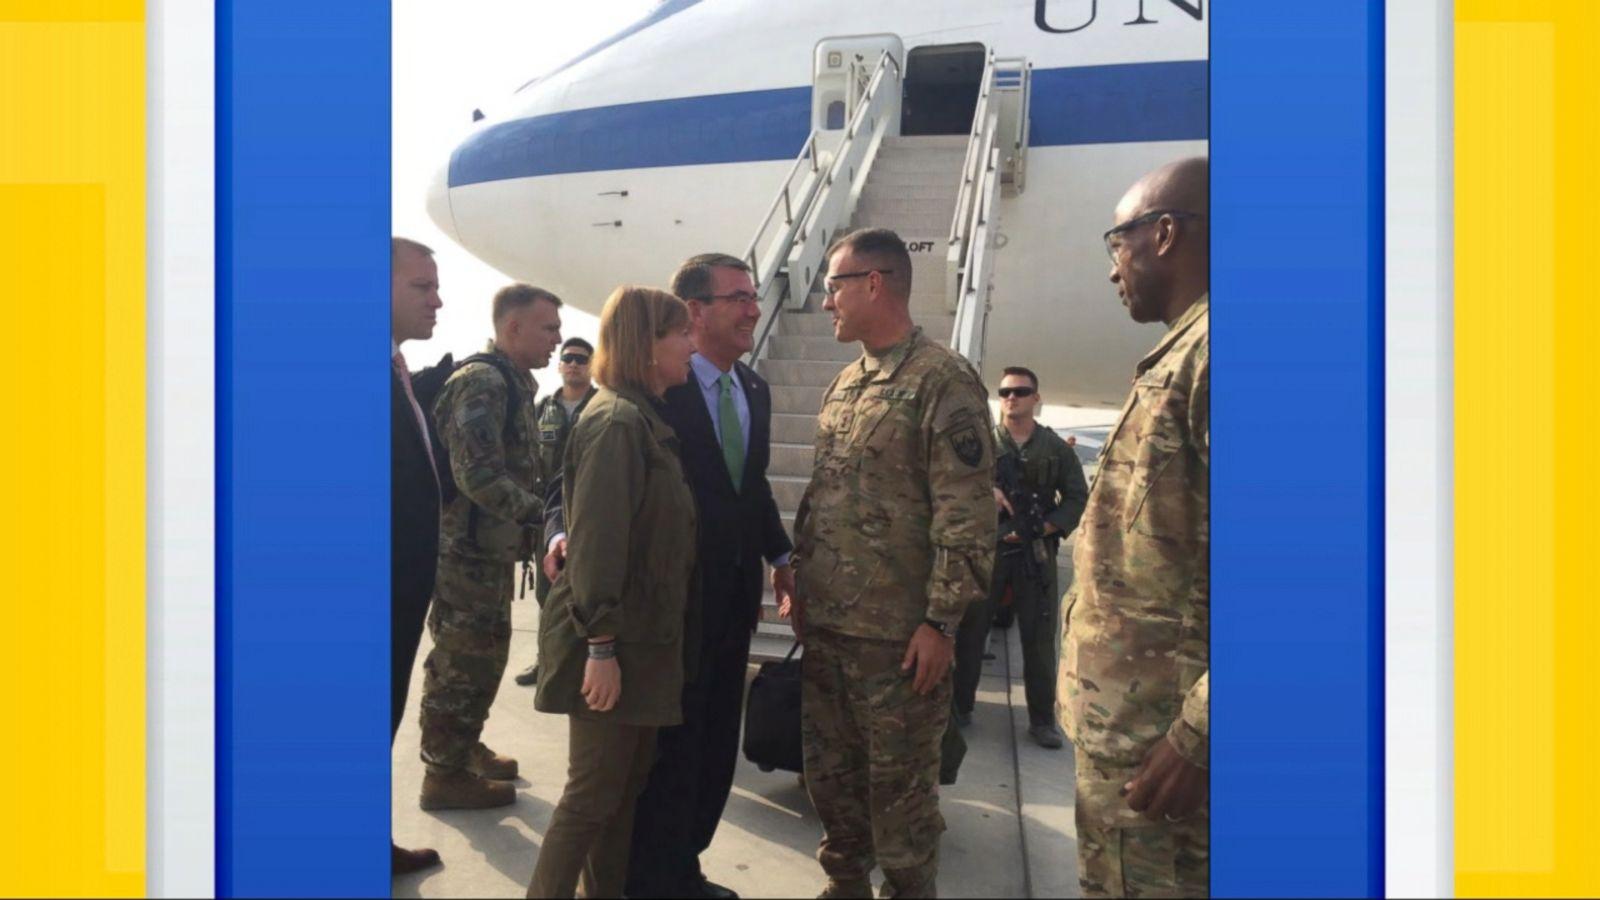 VIDEO: It is Carter's last planned trip to Afghanistan before handing off his Defense Department responsibilities to his designated successor, retired Marine Gen. James Mattis.